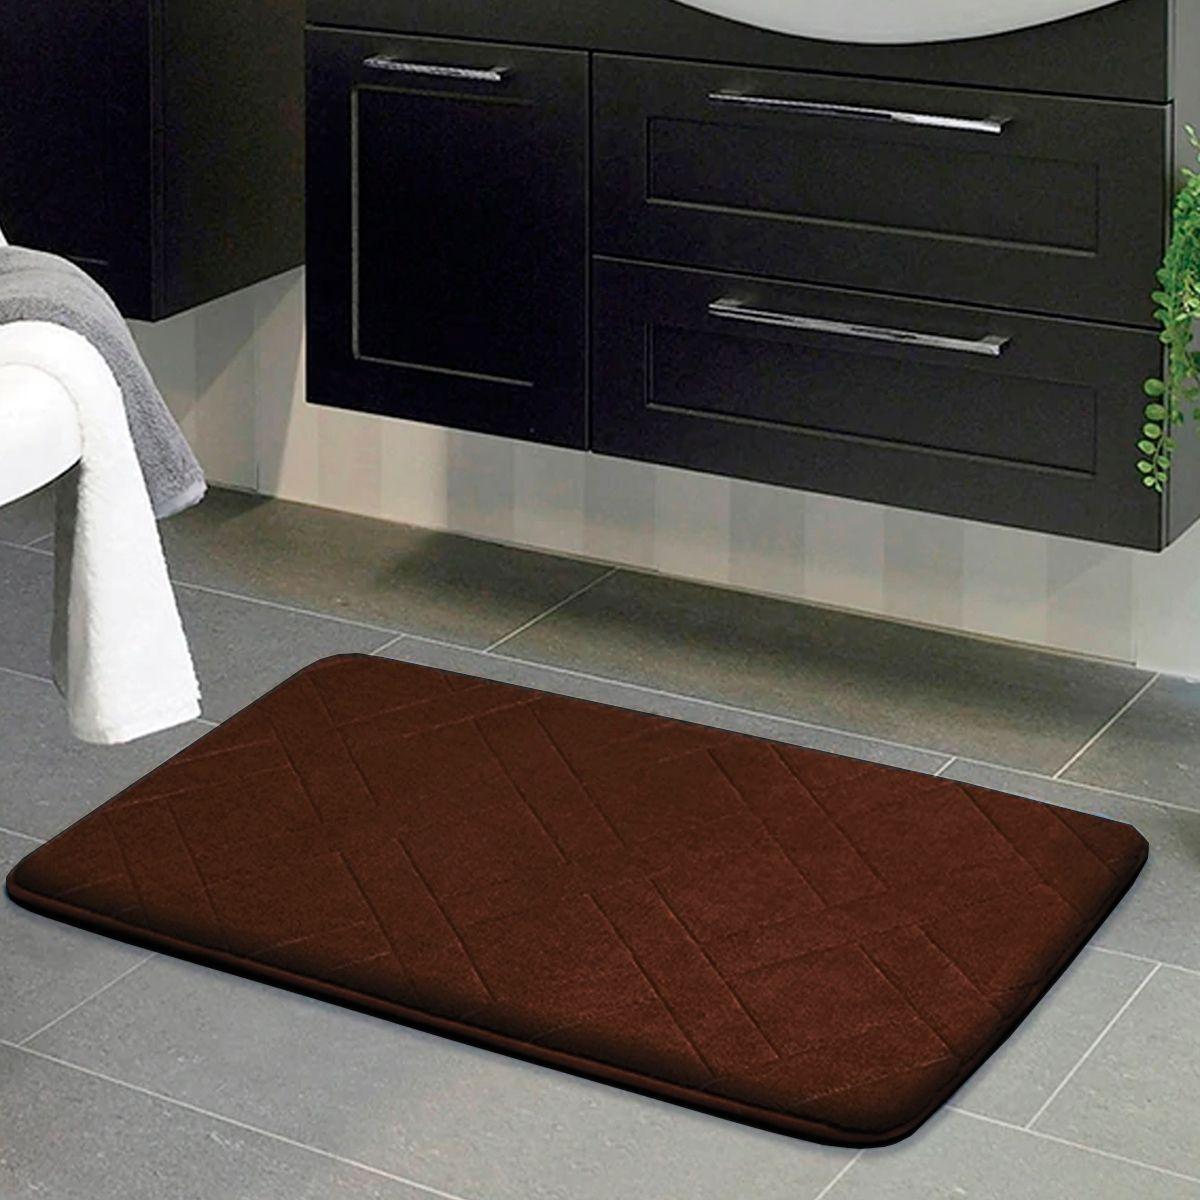 Tapete verona square 40x60 Chocolate